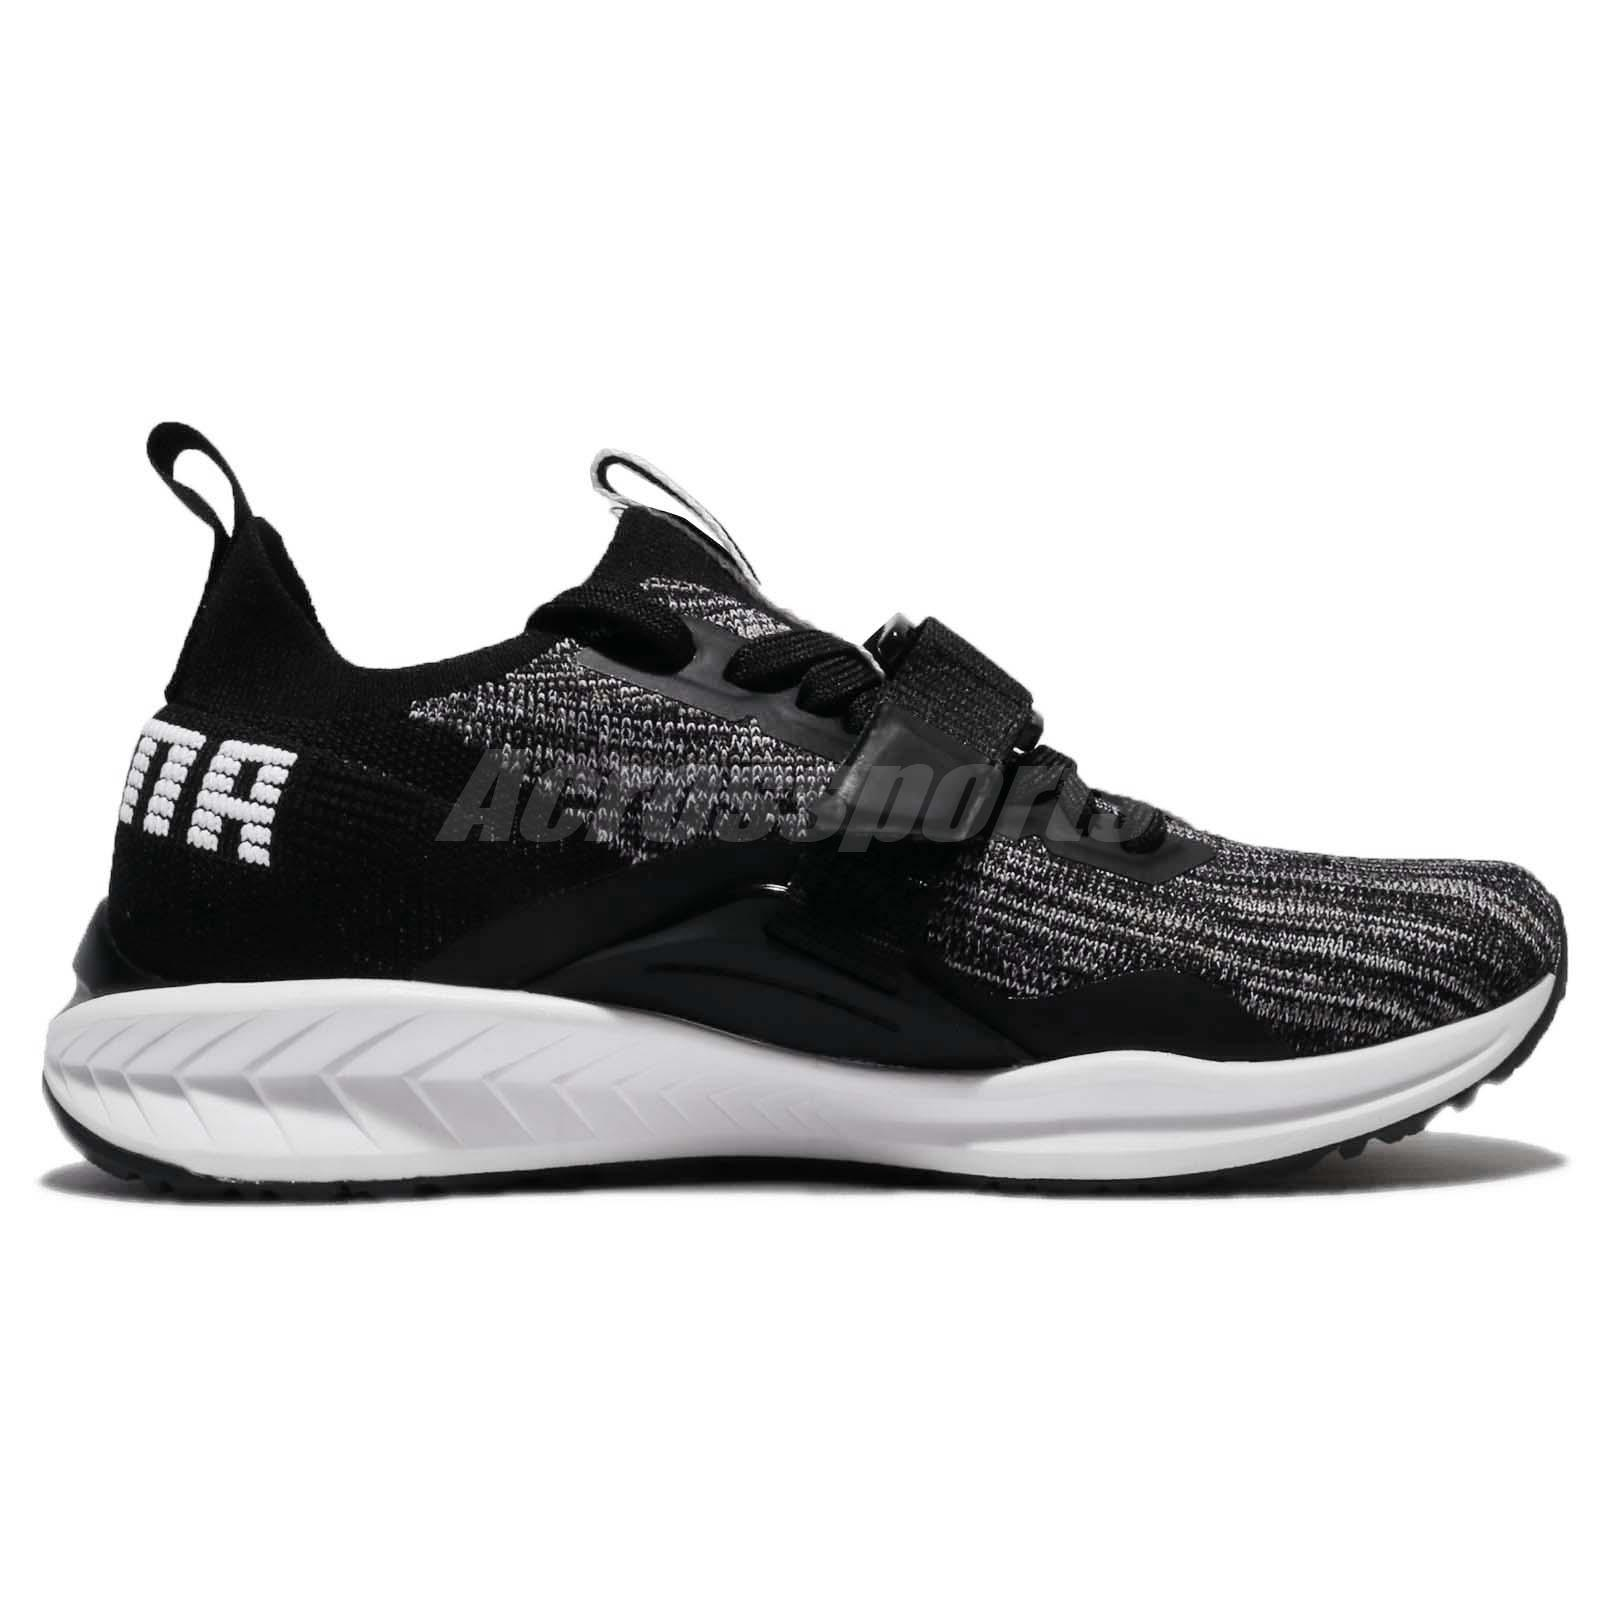 aa386a689629fd Puma Ignite EvoKnit Lo 2 II Black White Men Running Shoes Sneakers ...